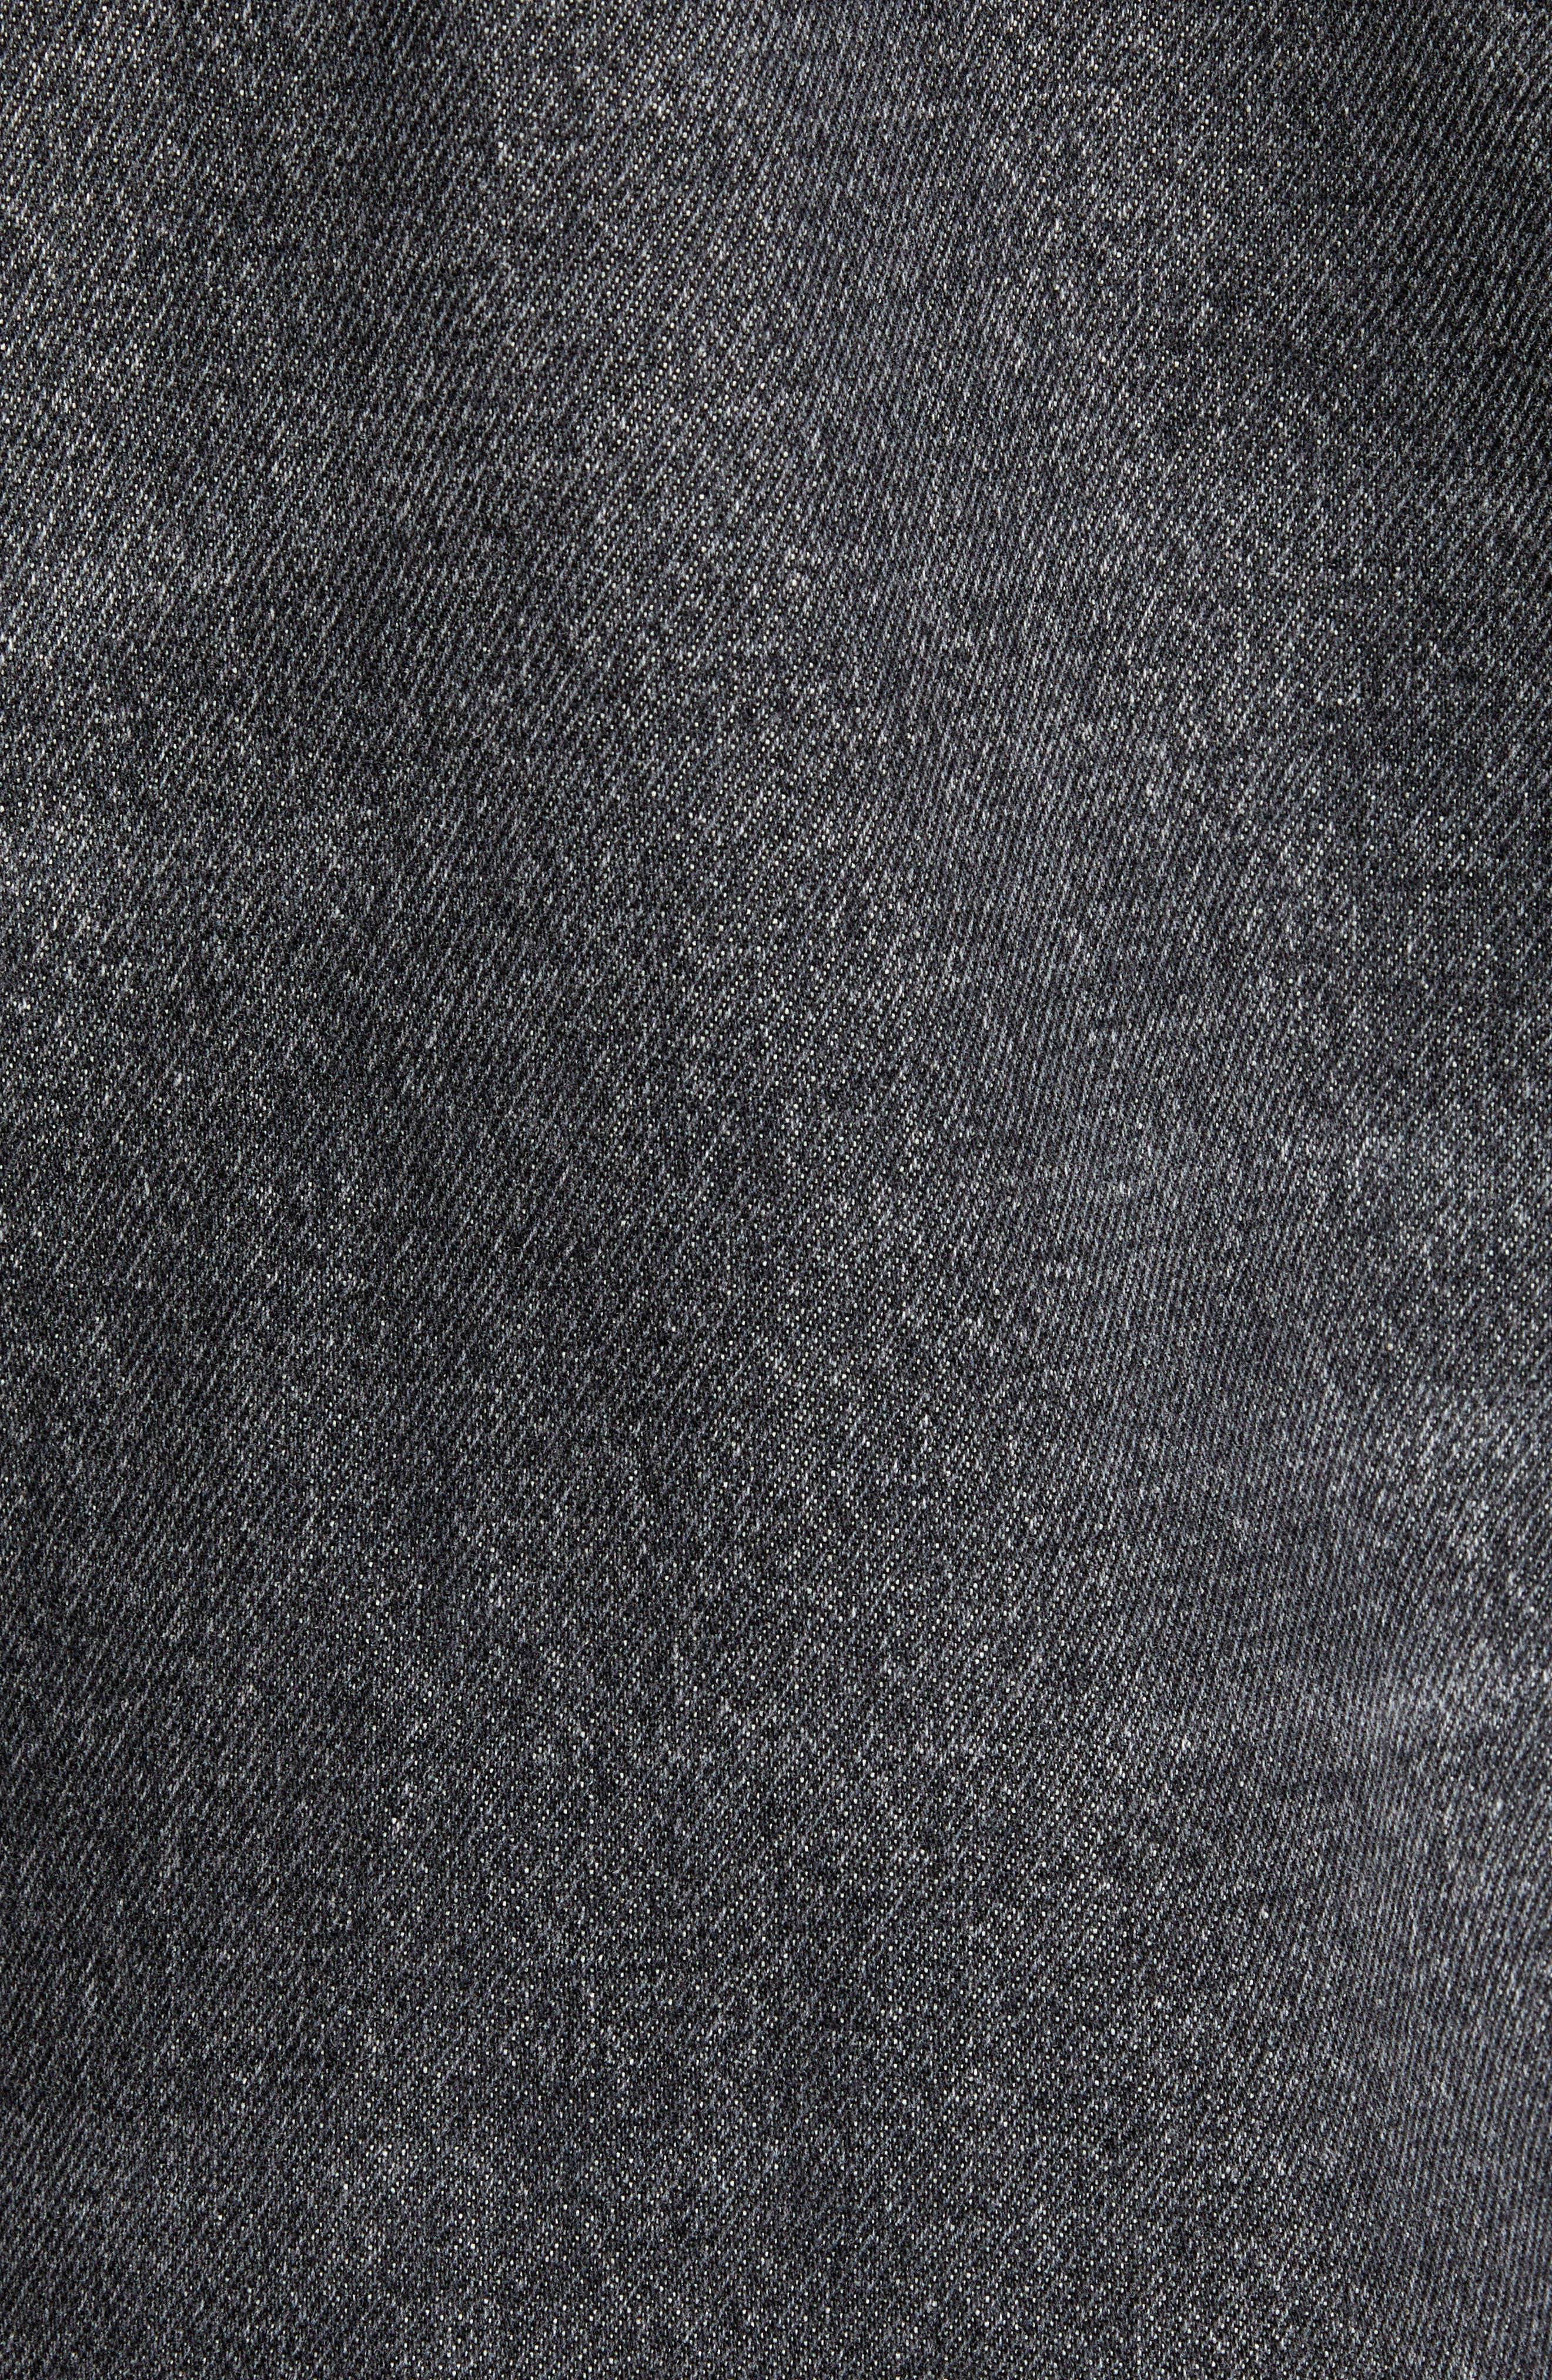 THE KOOPLES, Slim Fit Denim Jacket, Alternate thumbnail 7, color, BLACK DENIM EFFECT